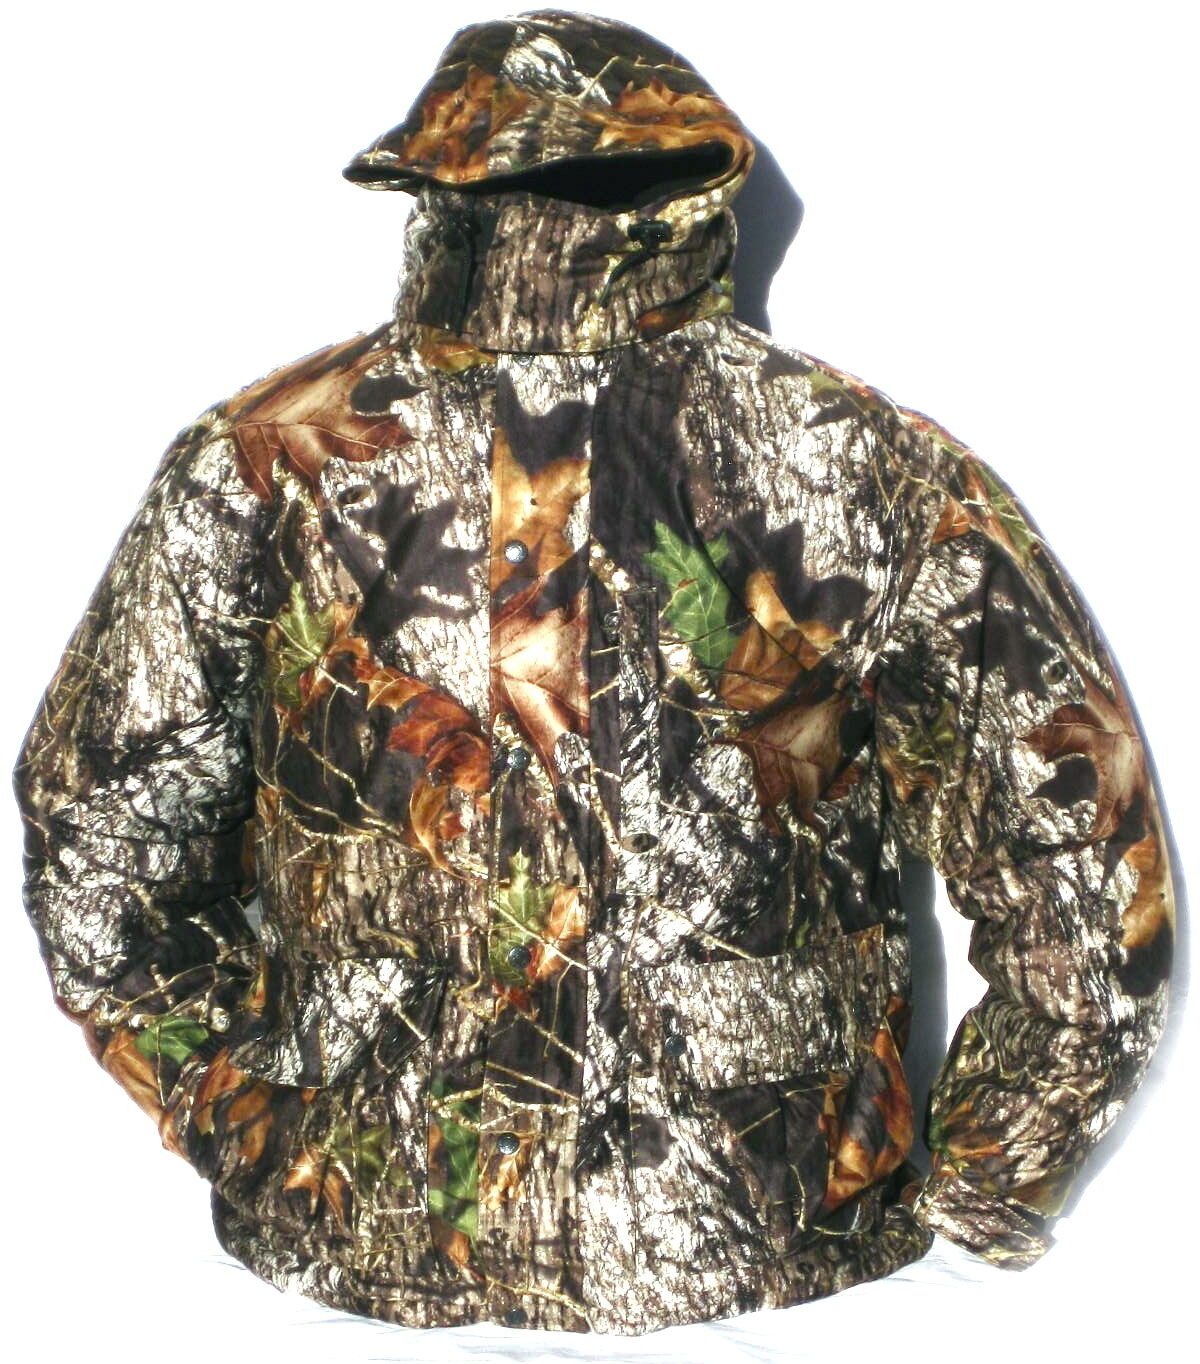 Cabela's Men's Mossy Oak New Break-Up Ultra Thinsulate 185 Gram Hunting Parka